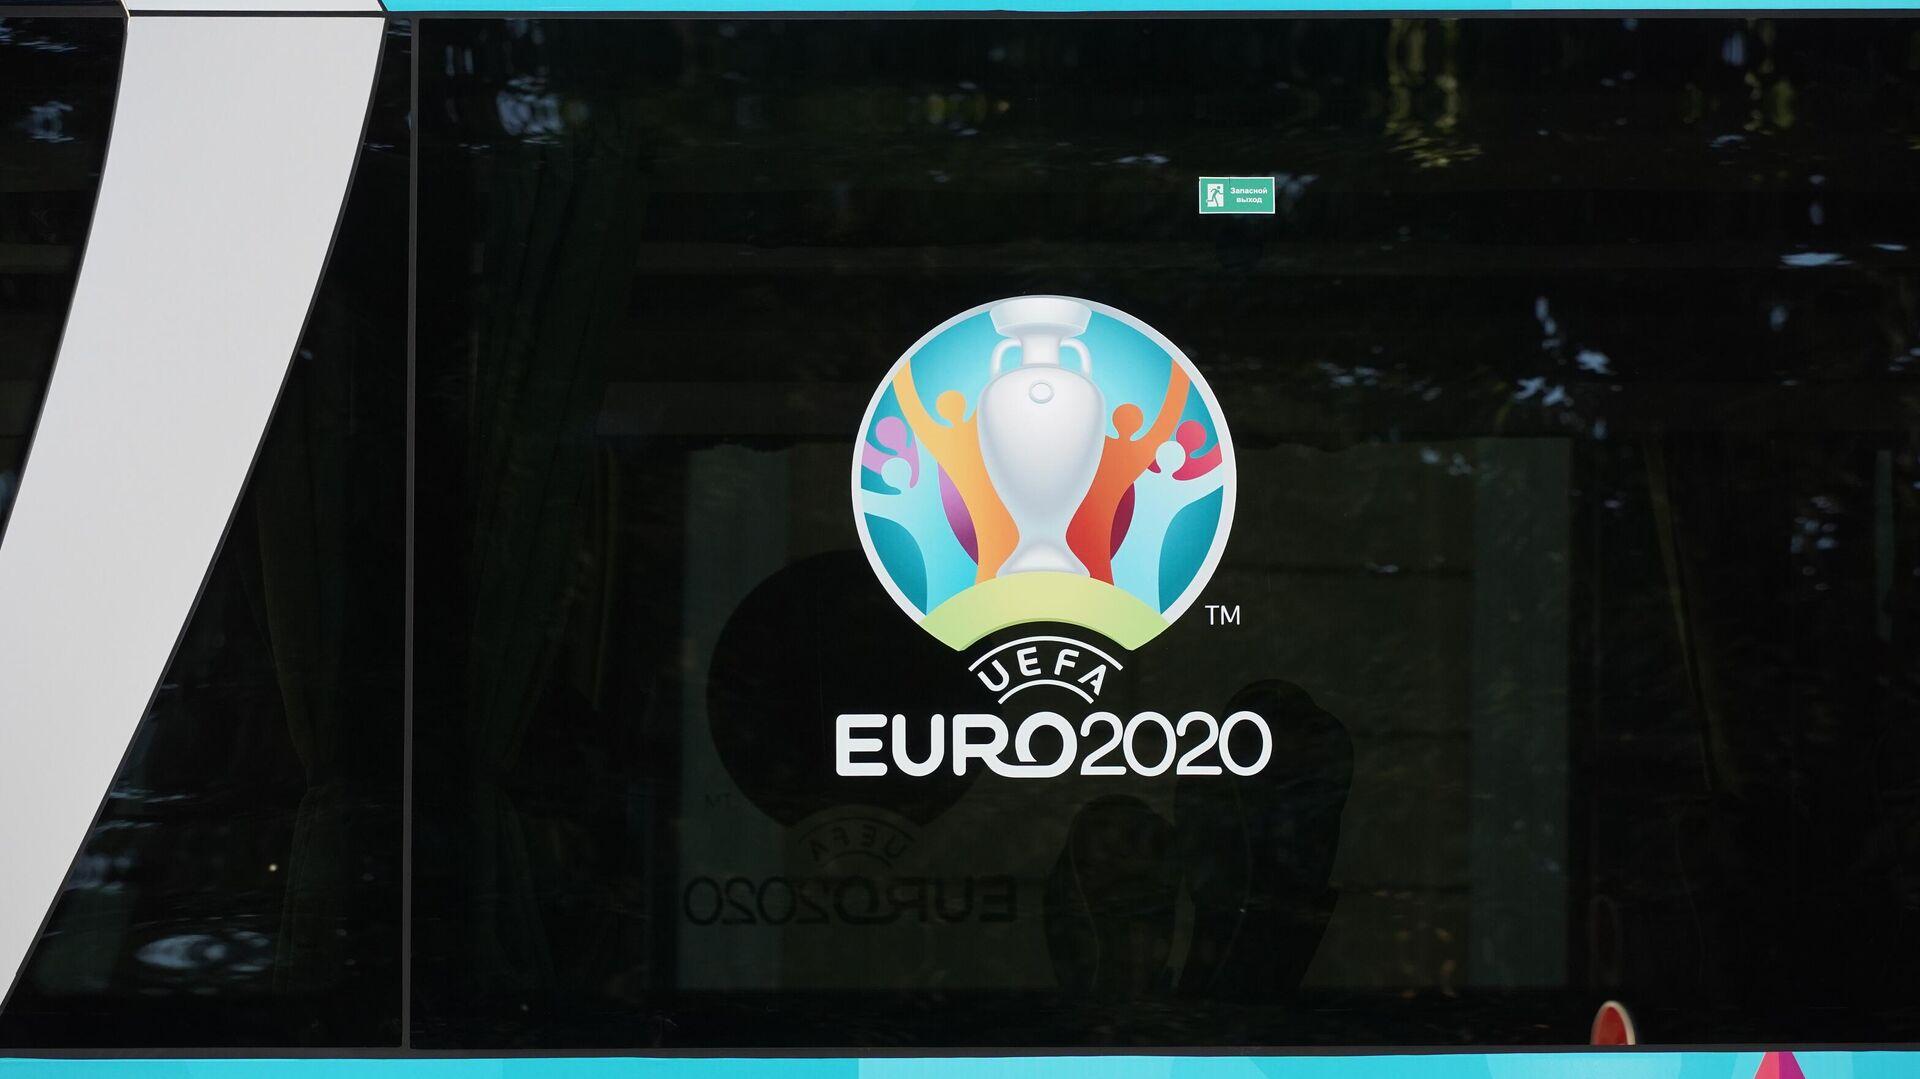 Логотип ЕВРО-2020 - РИА Новости, 1920, 11.06.2021